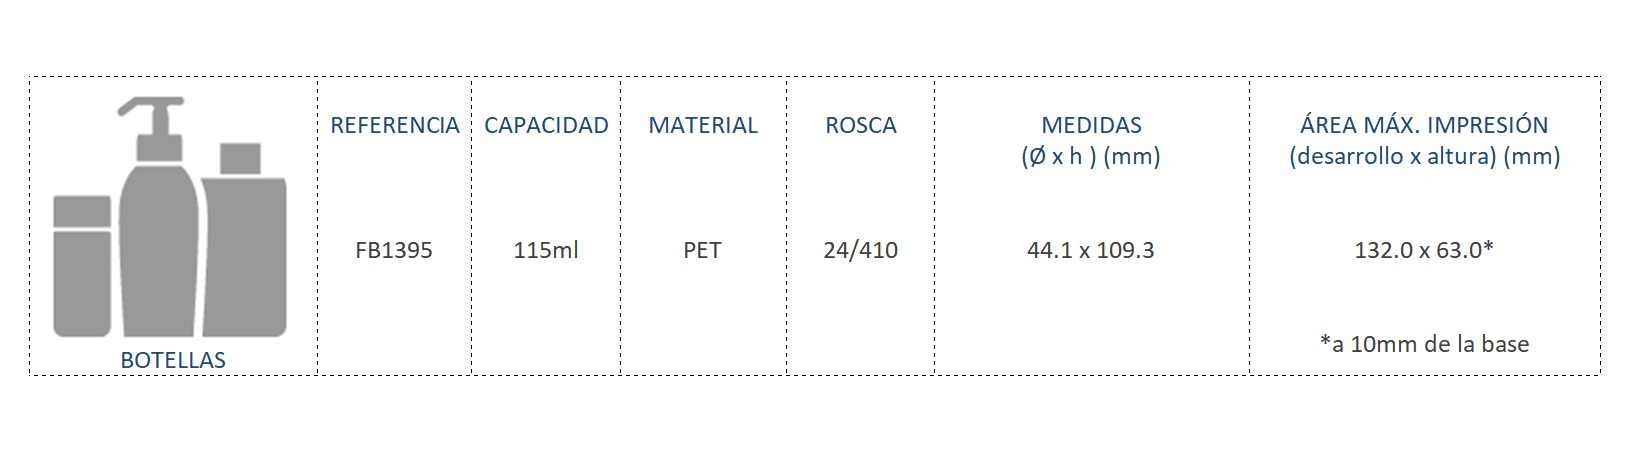 Cuadro de materiales botella FB1395